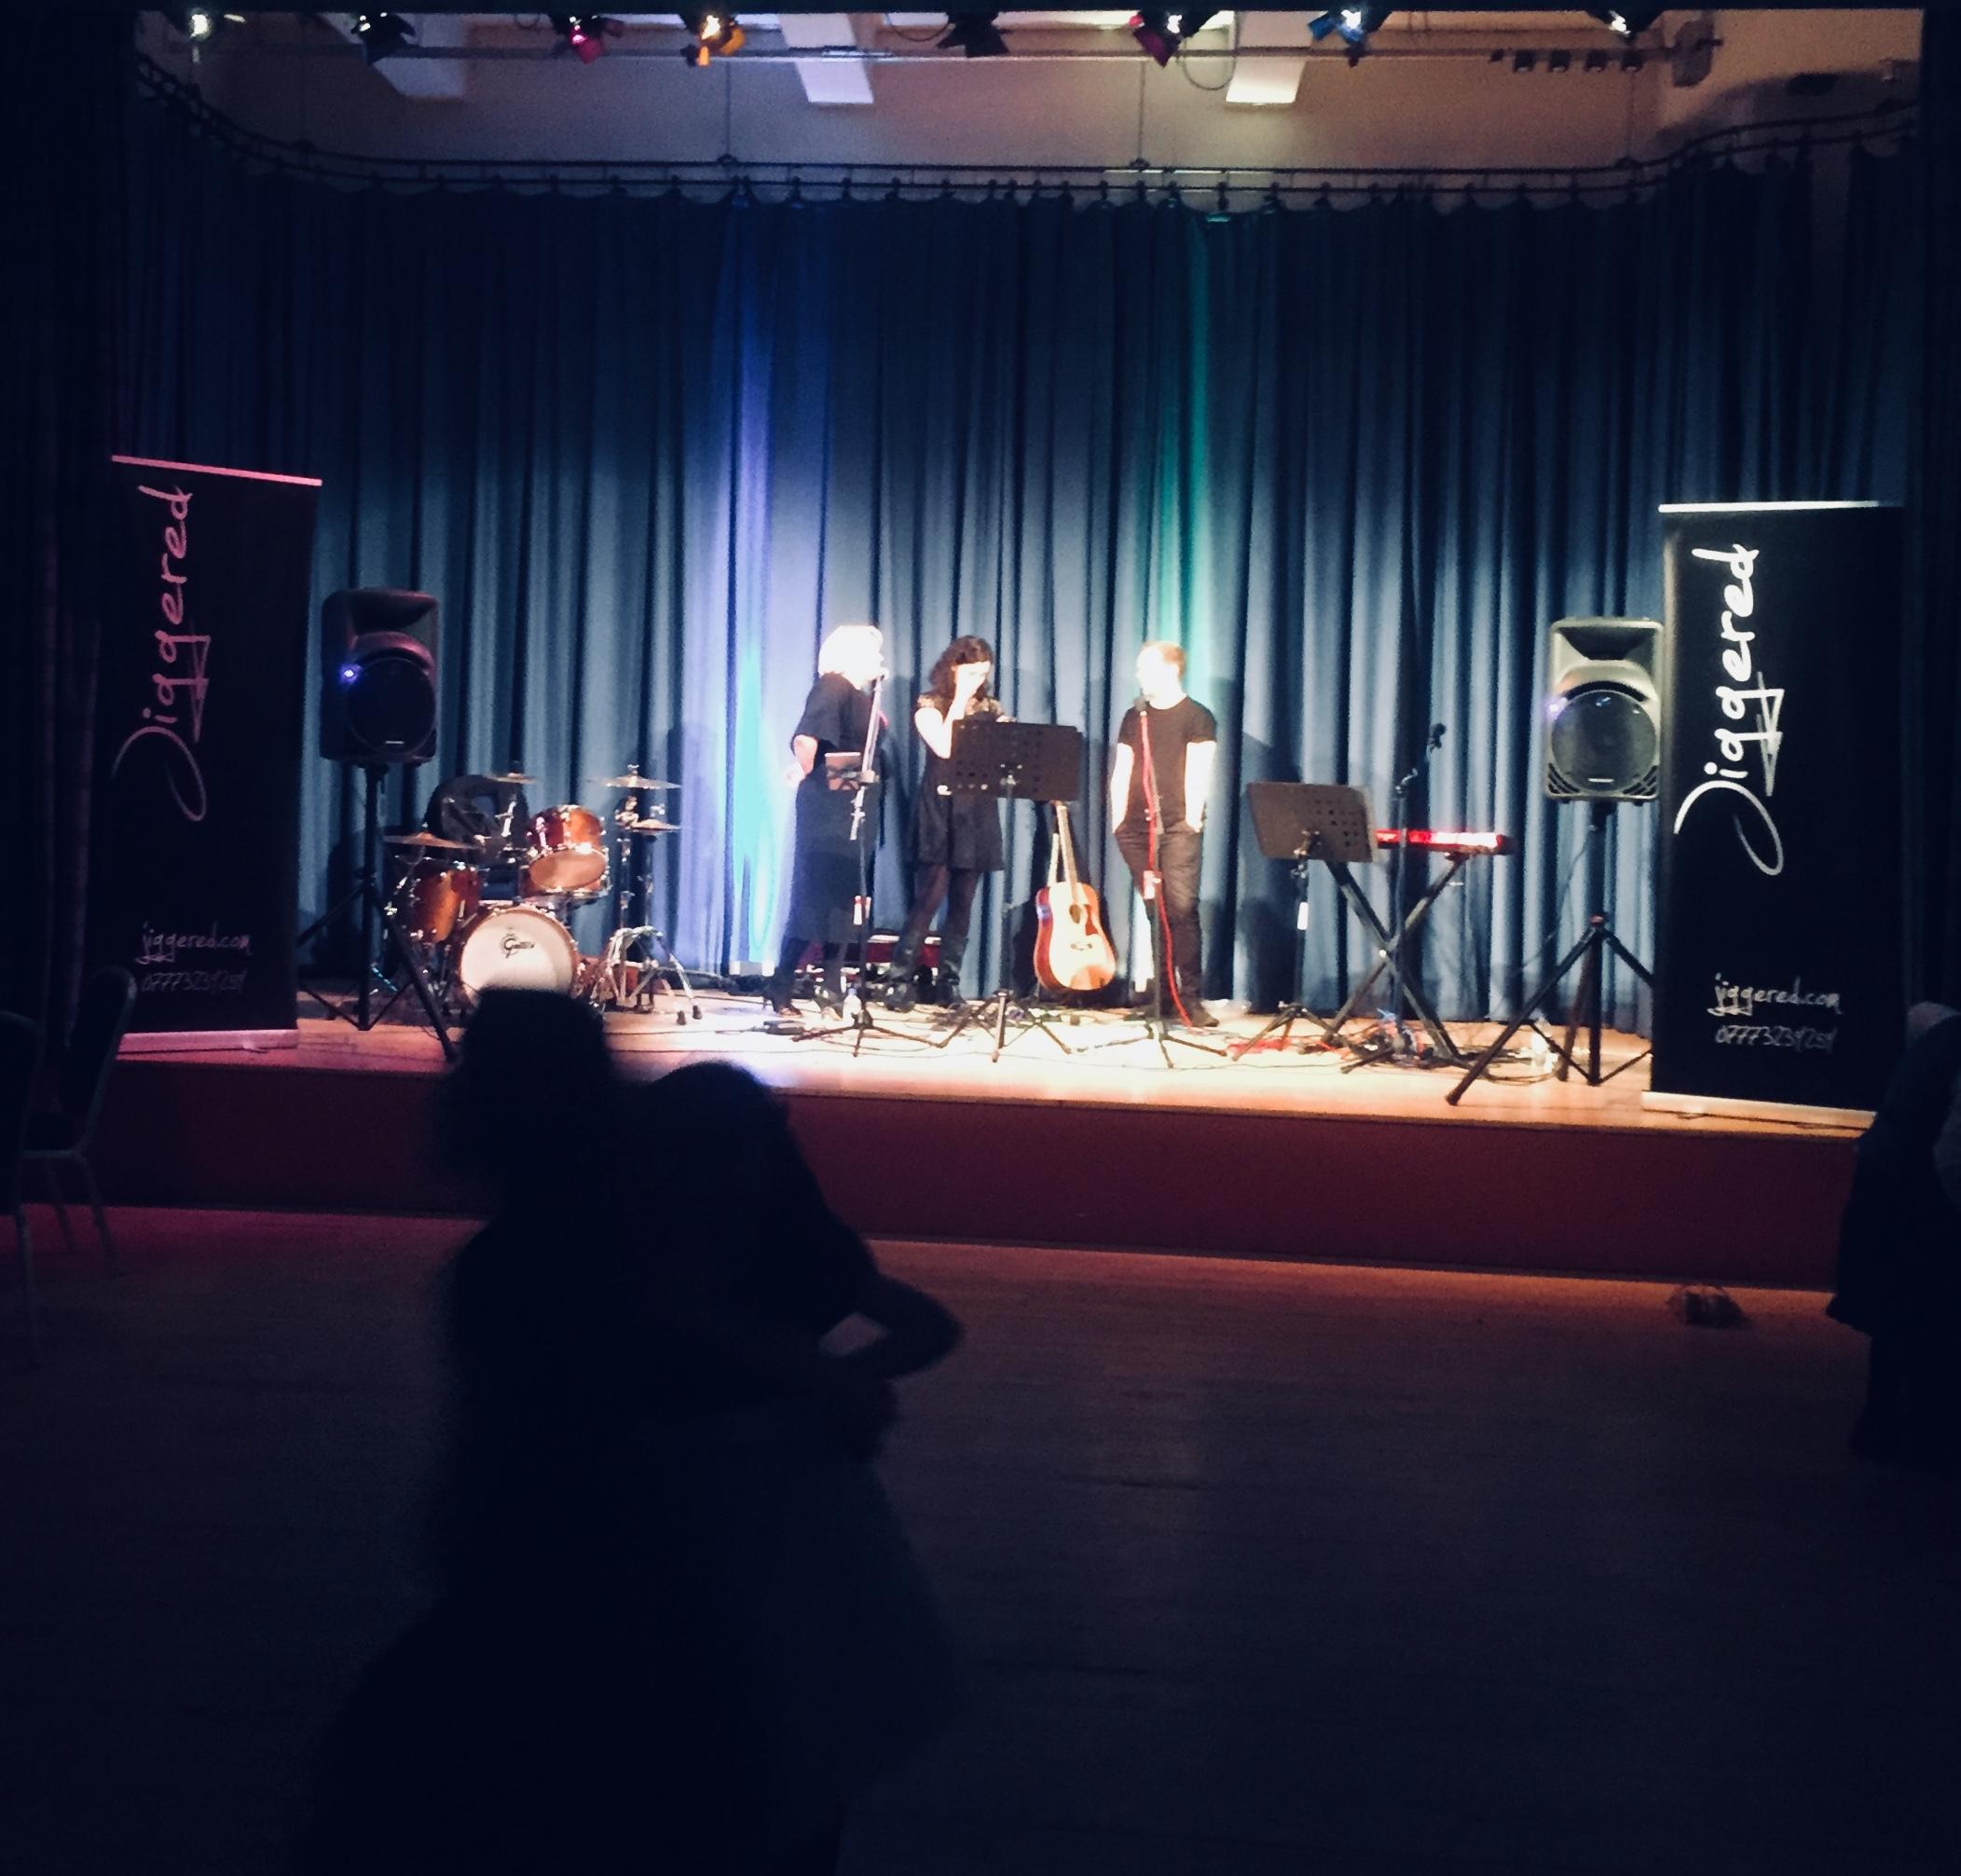 60a5b-jiggered-ceilidh-band-national-piping-centre-glasgow-wedding-christian-union-strathclyde-nashville.jpg